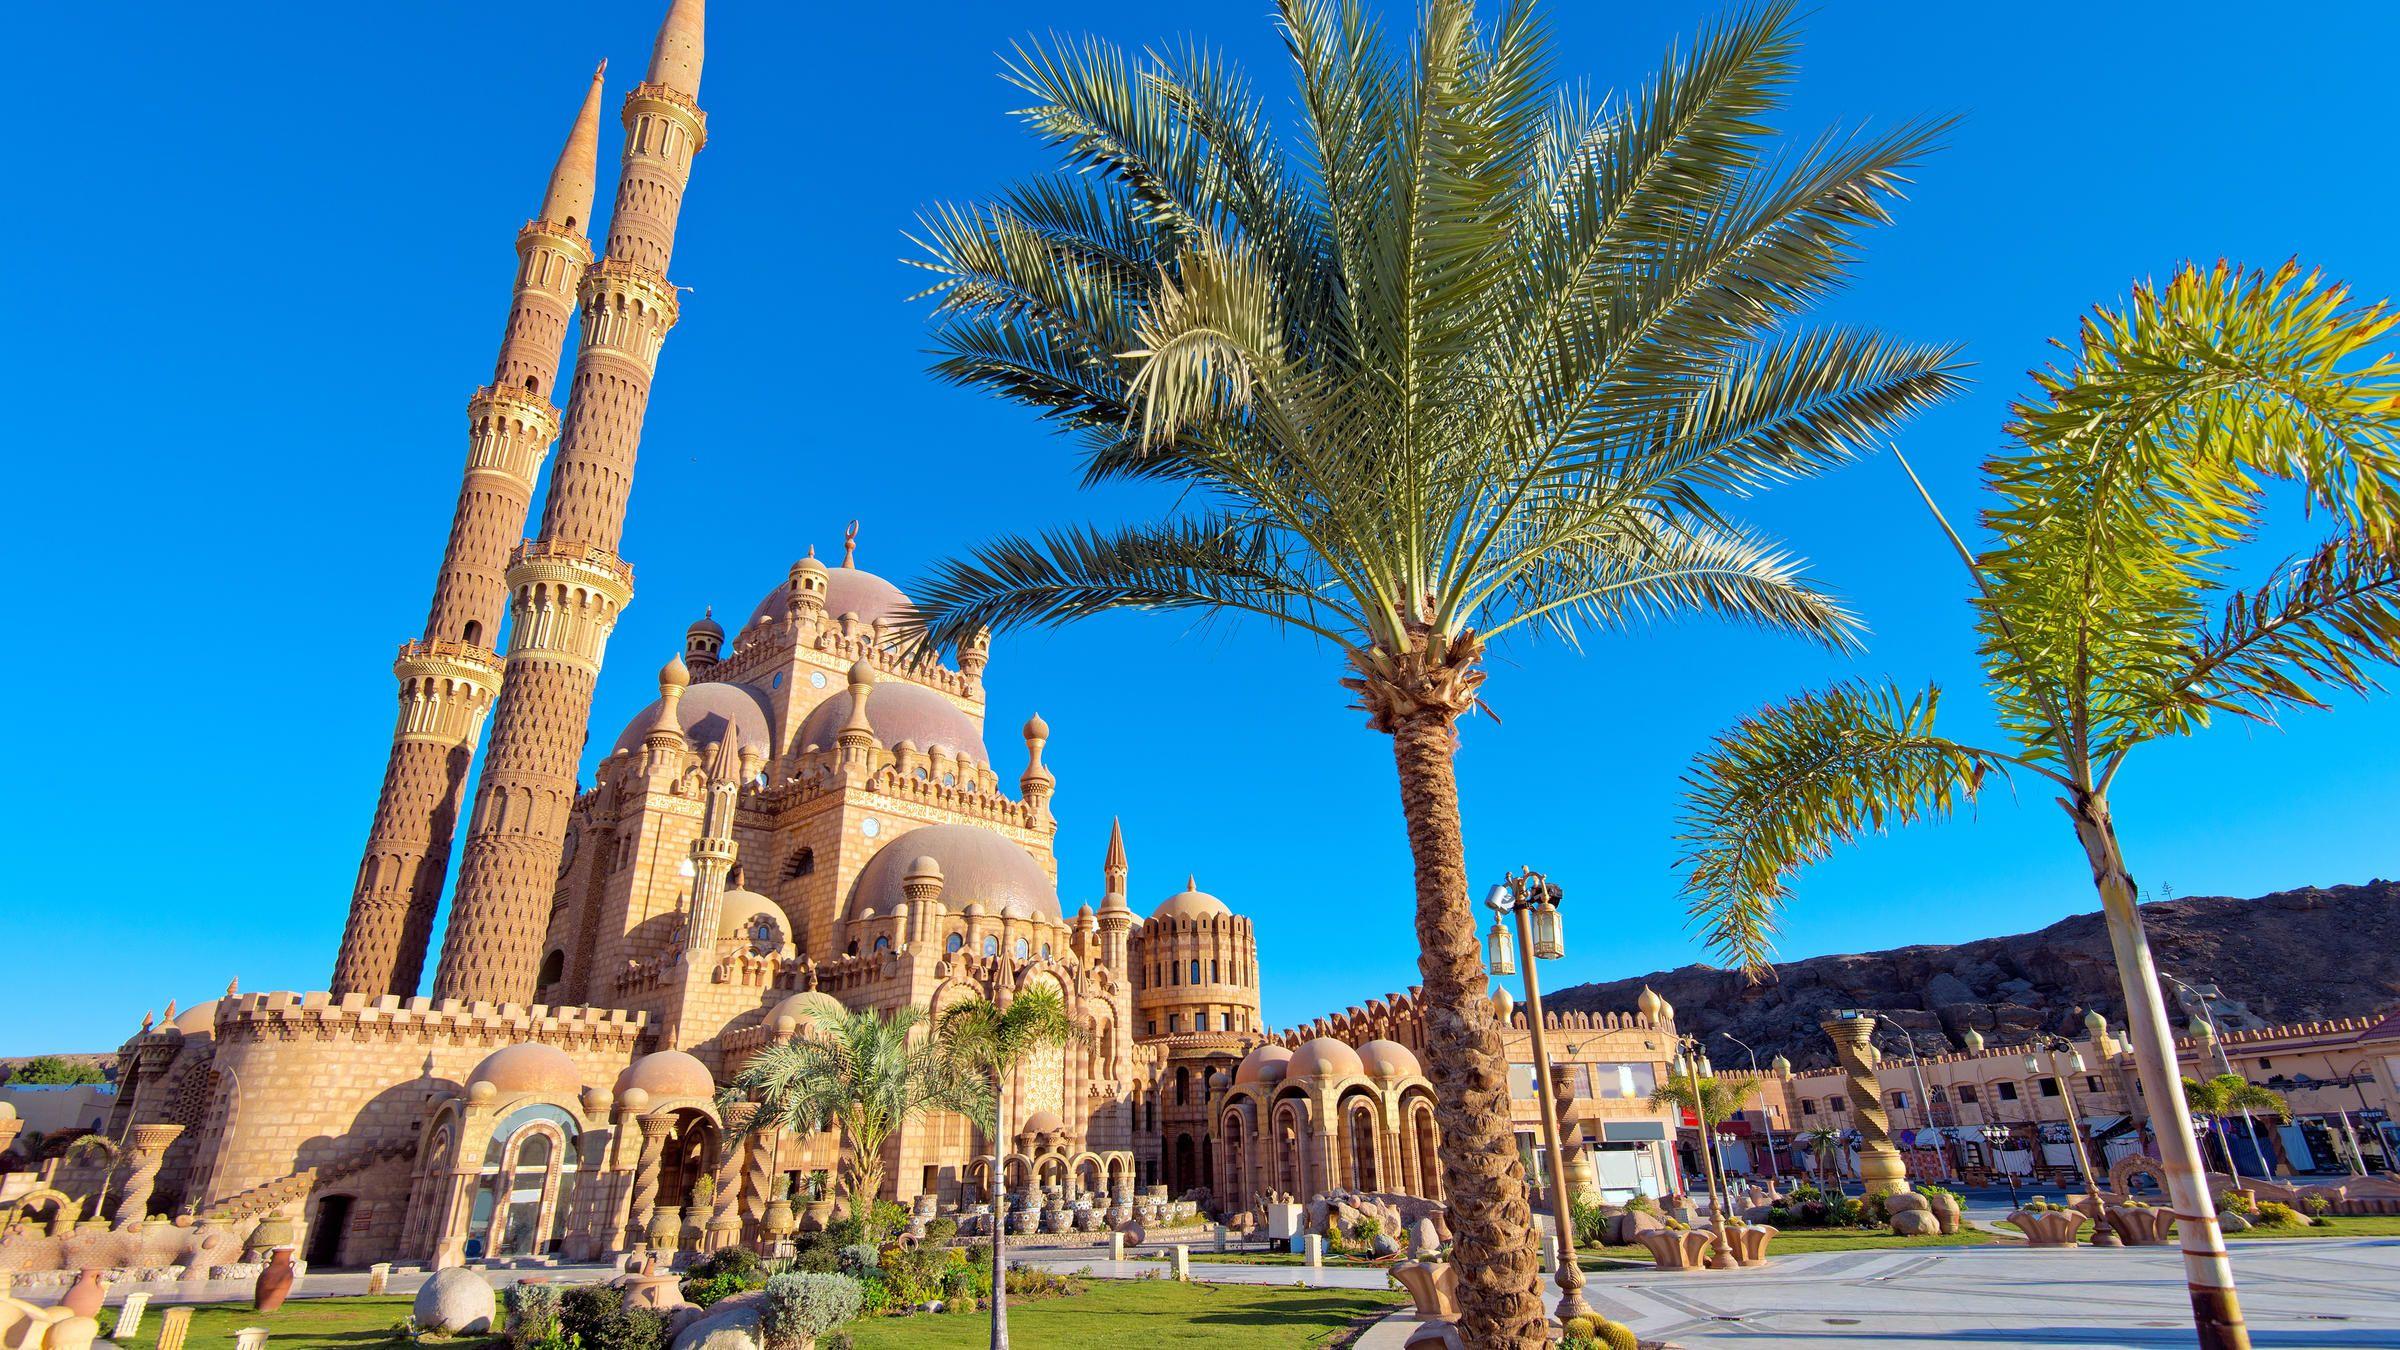 Єгипет. old market мечеть